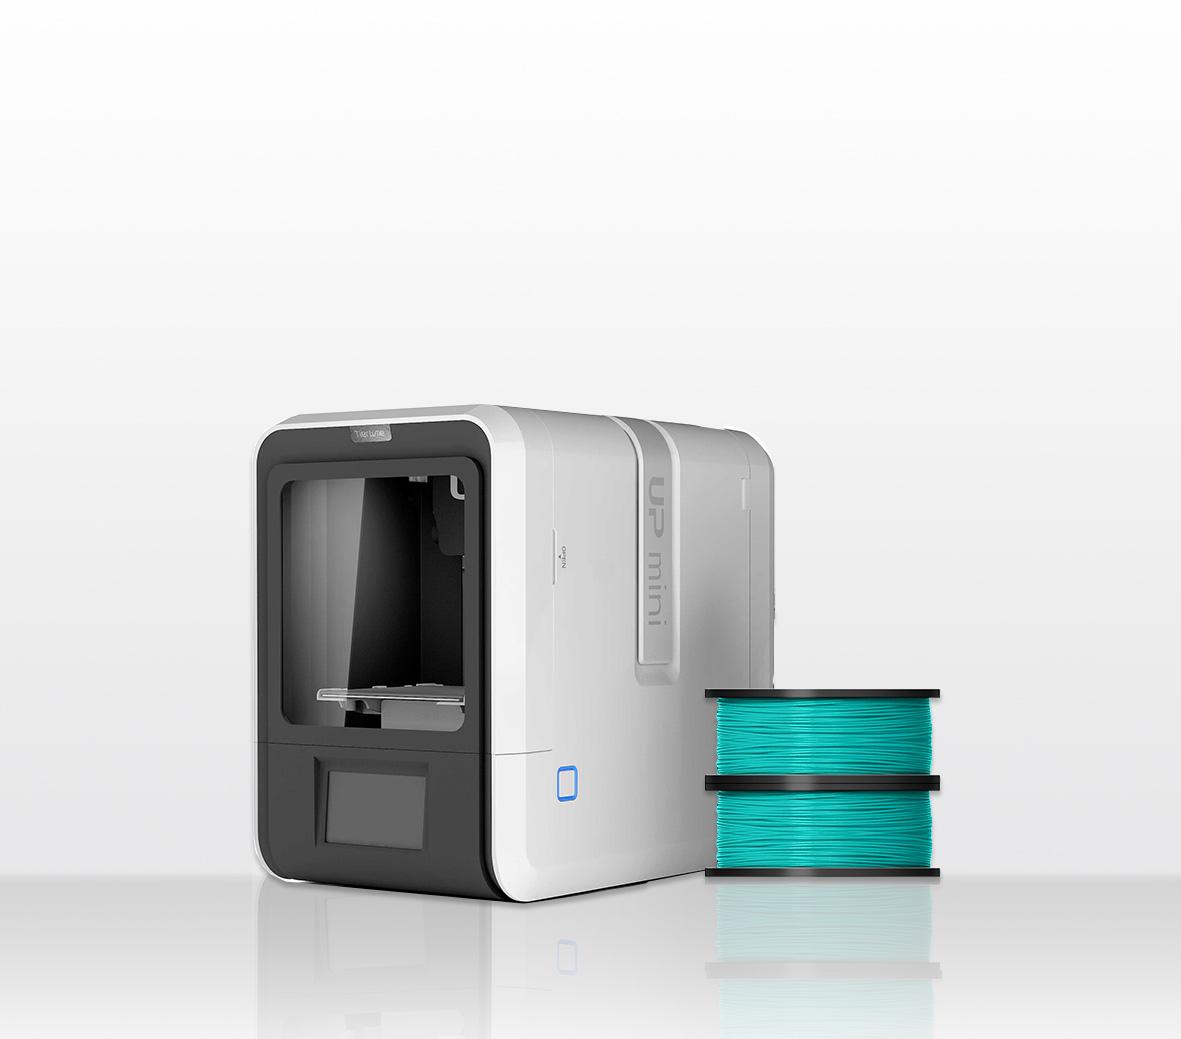 MAK_Shop Images_Printer 2kg